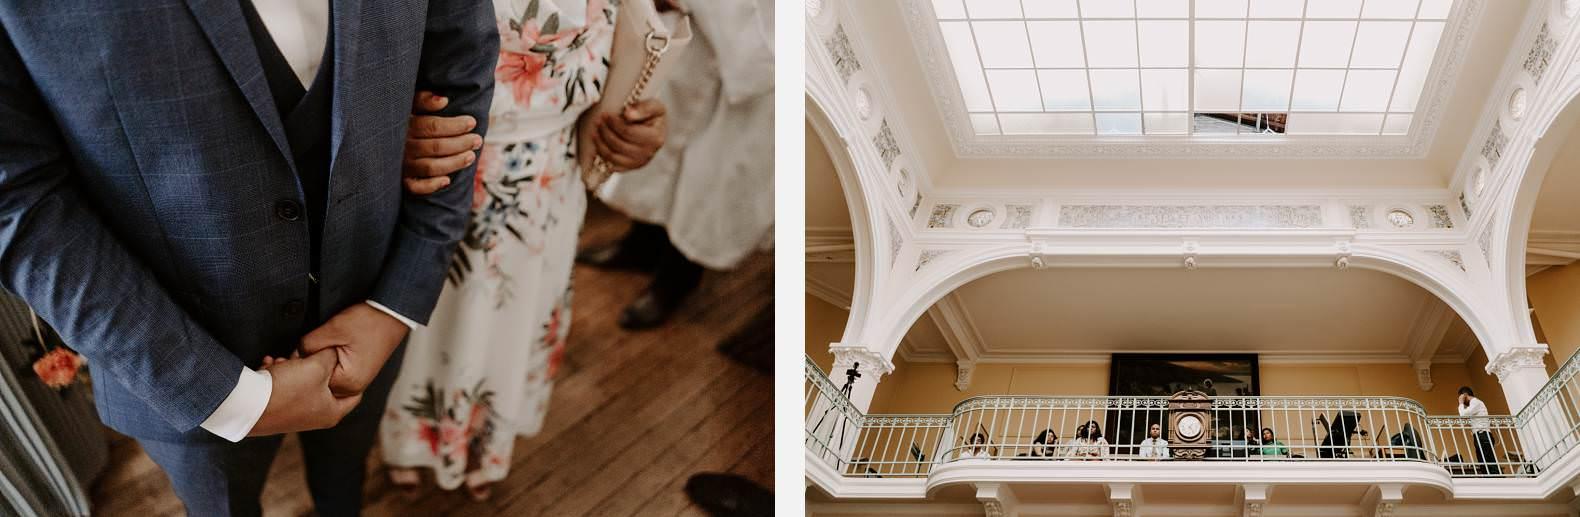 mariage manoir de corny photographe bel esprit 0017 1